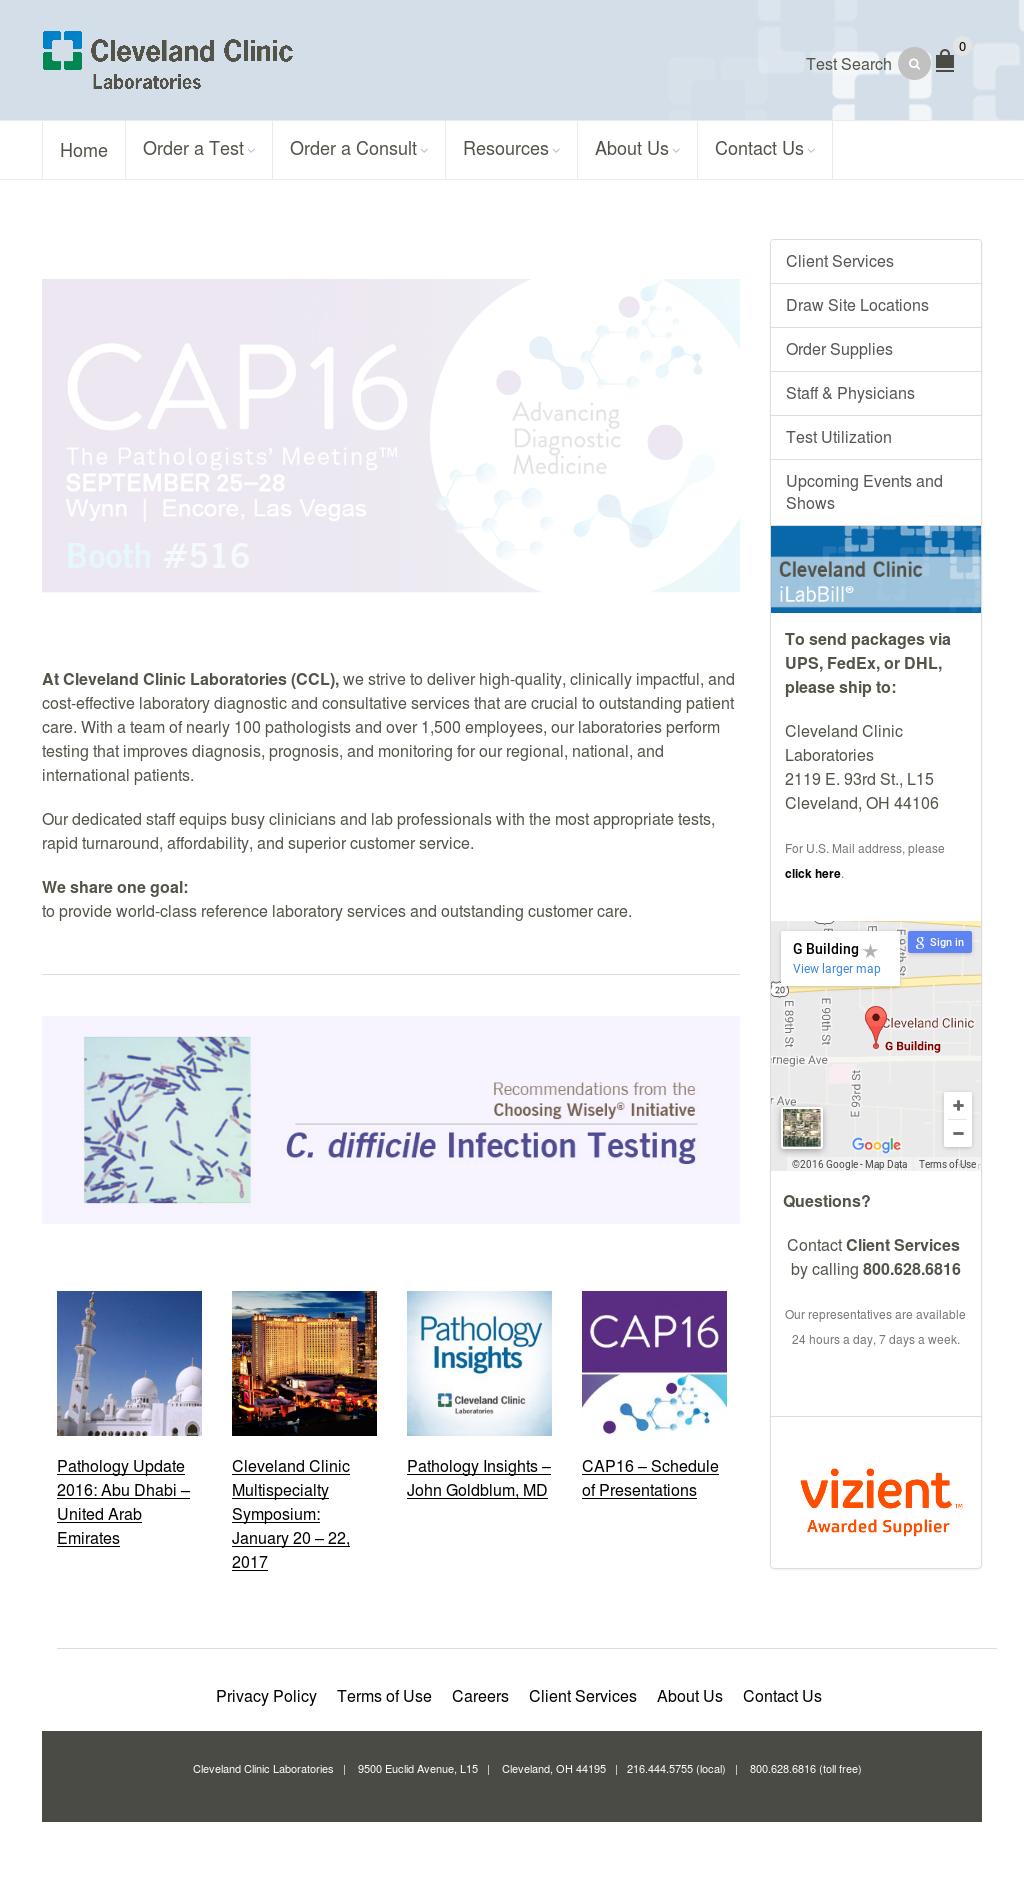 Cleveland Clinic Laboratories Competitors, Revenue and